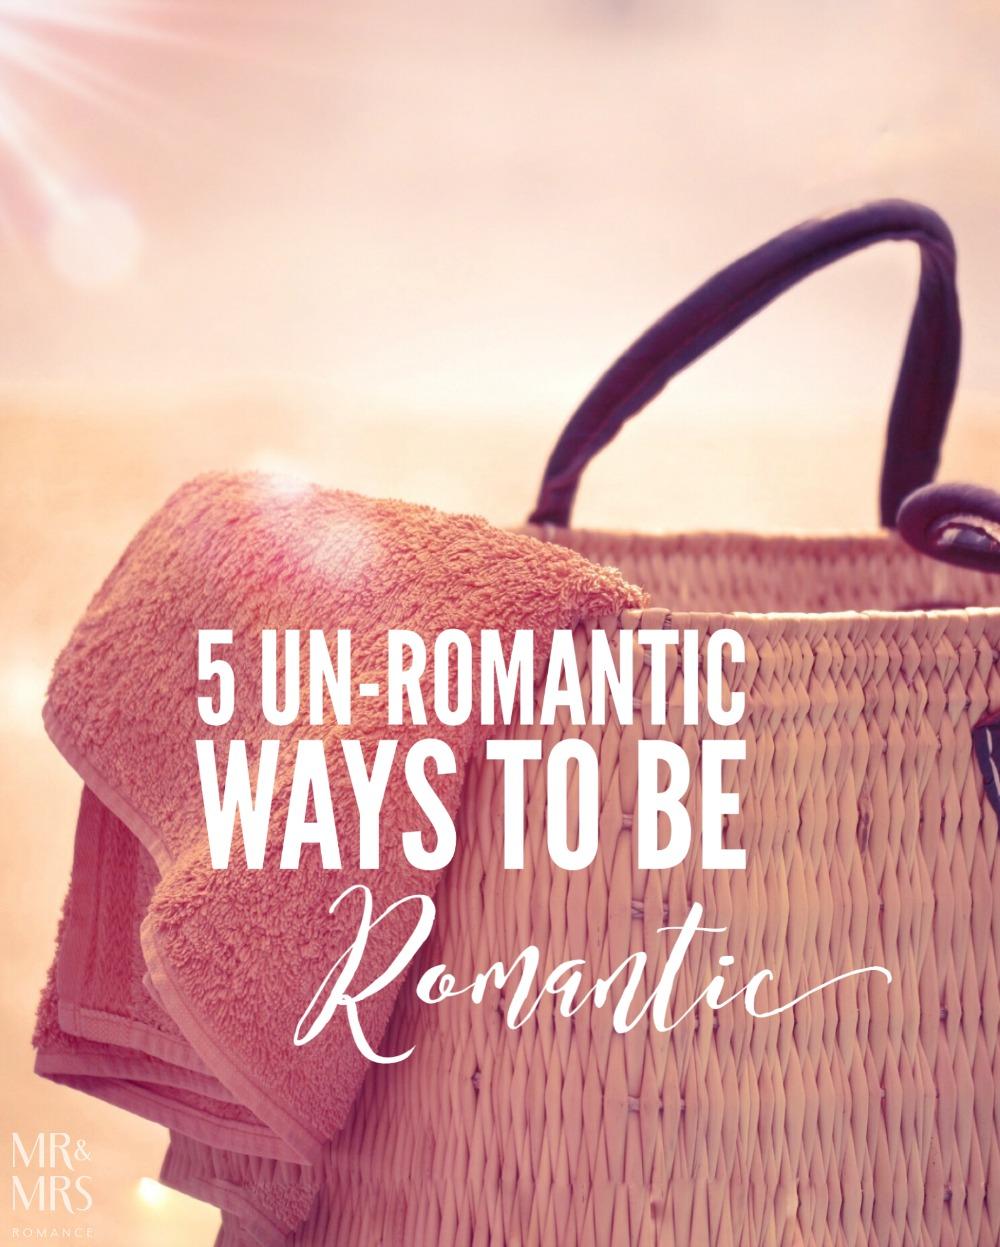 Unromantic ways to be romantic - Mr & Mrs Romance